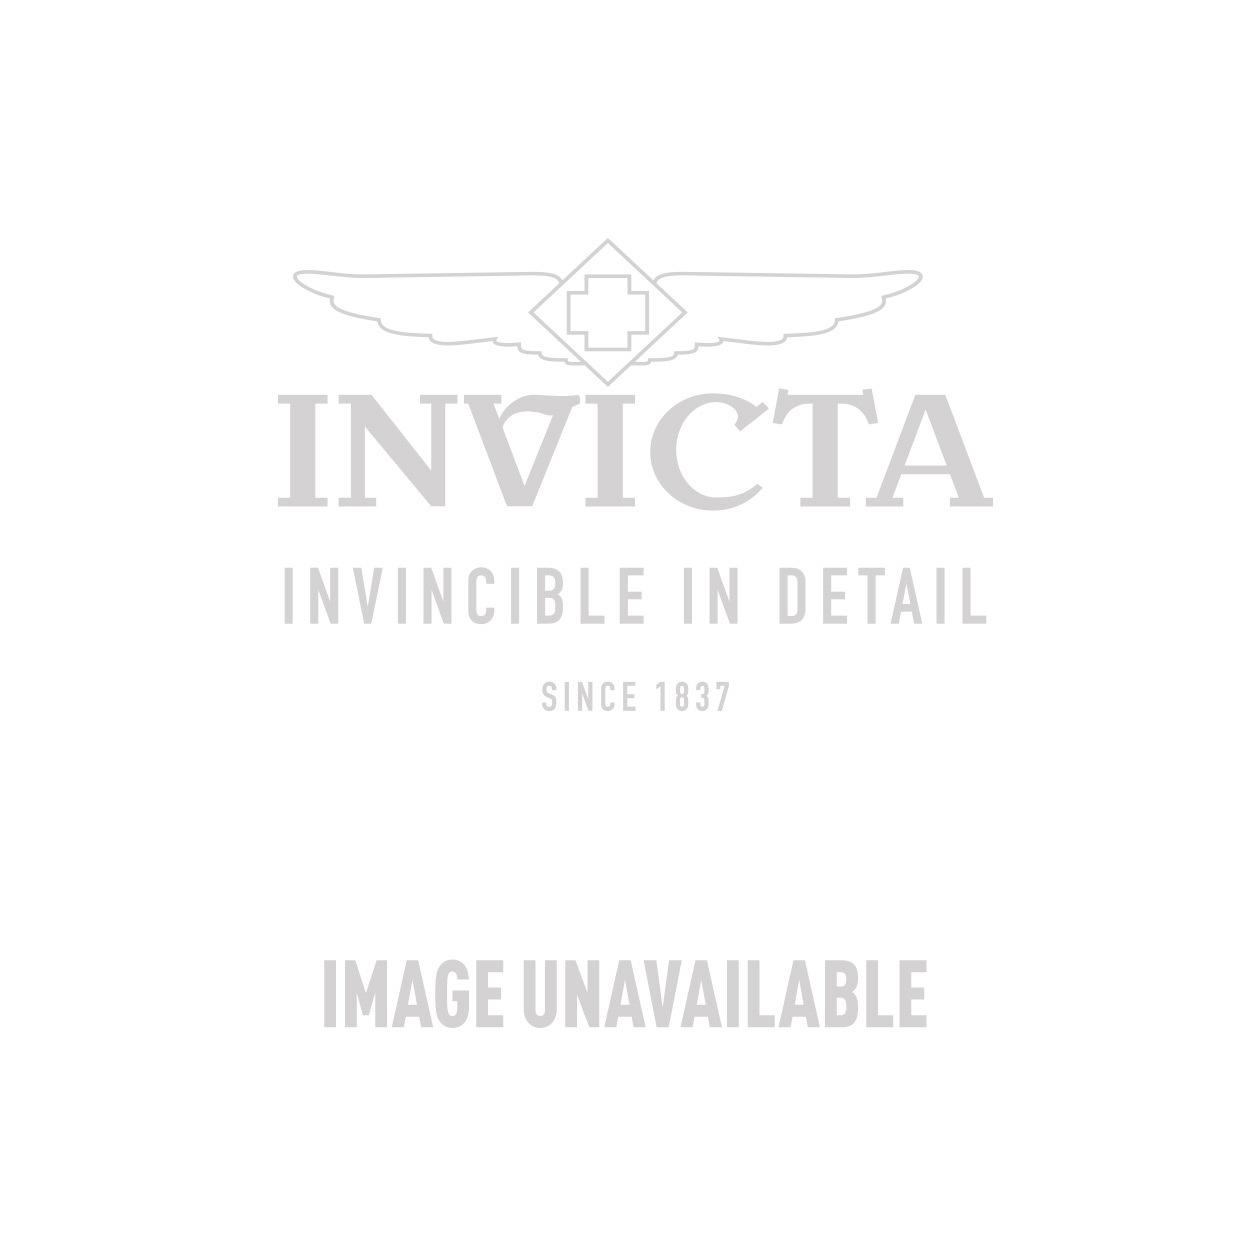 Invicta Corduba Mechanical Watch - Gold, Gunmetal case with Brown tone Polyurethane band - Model 80096